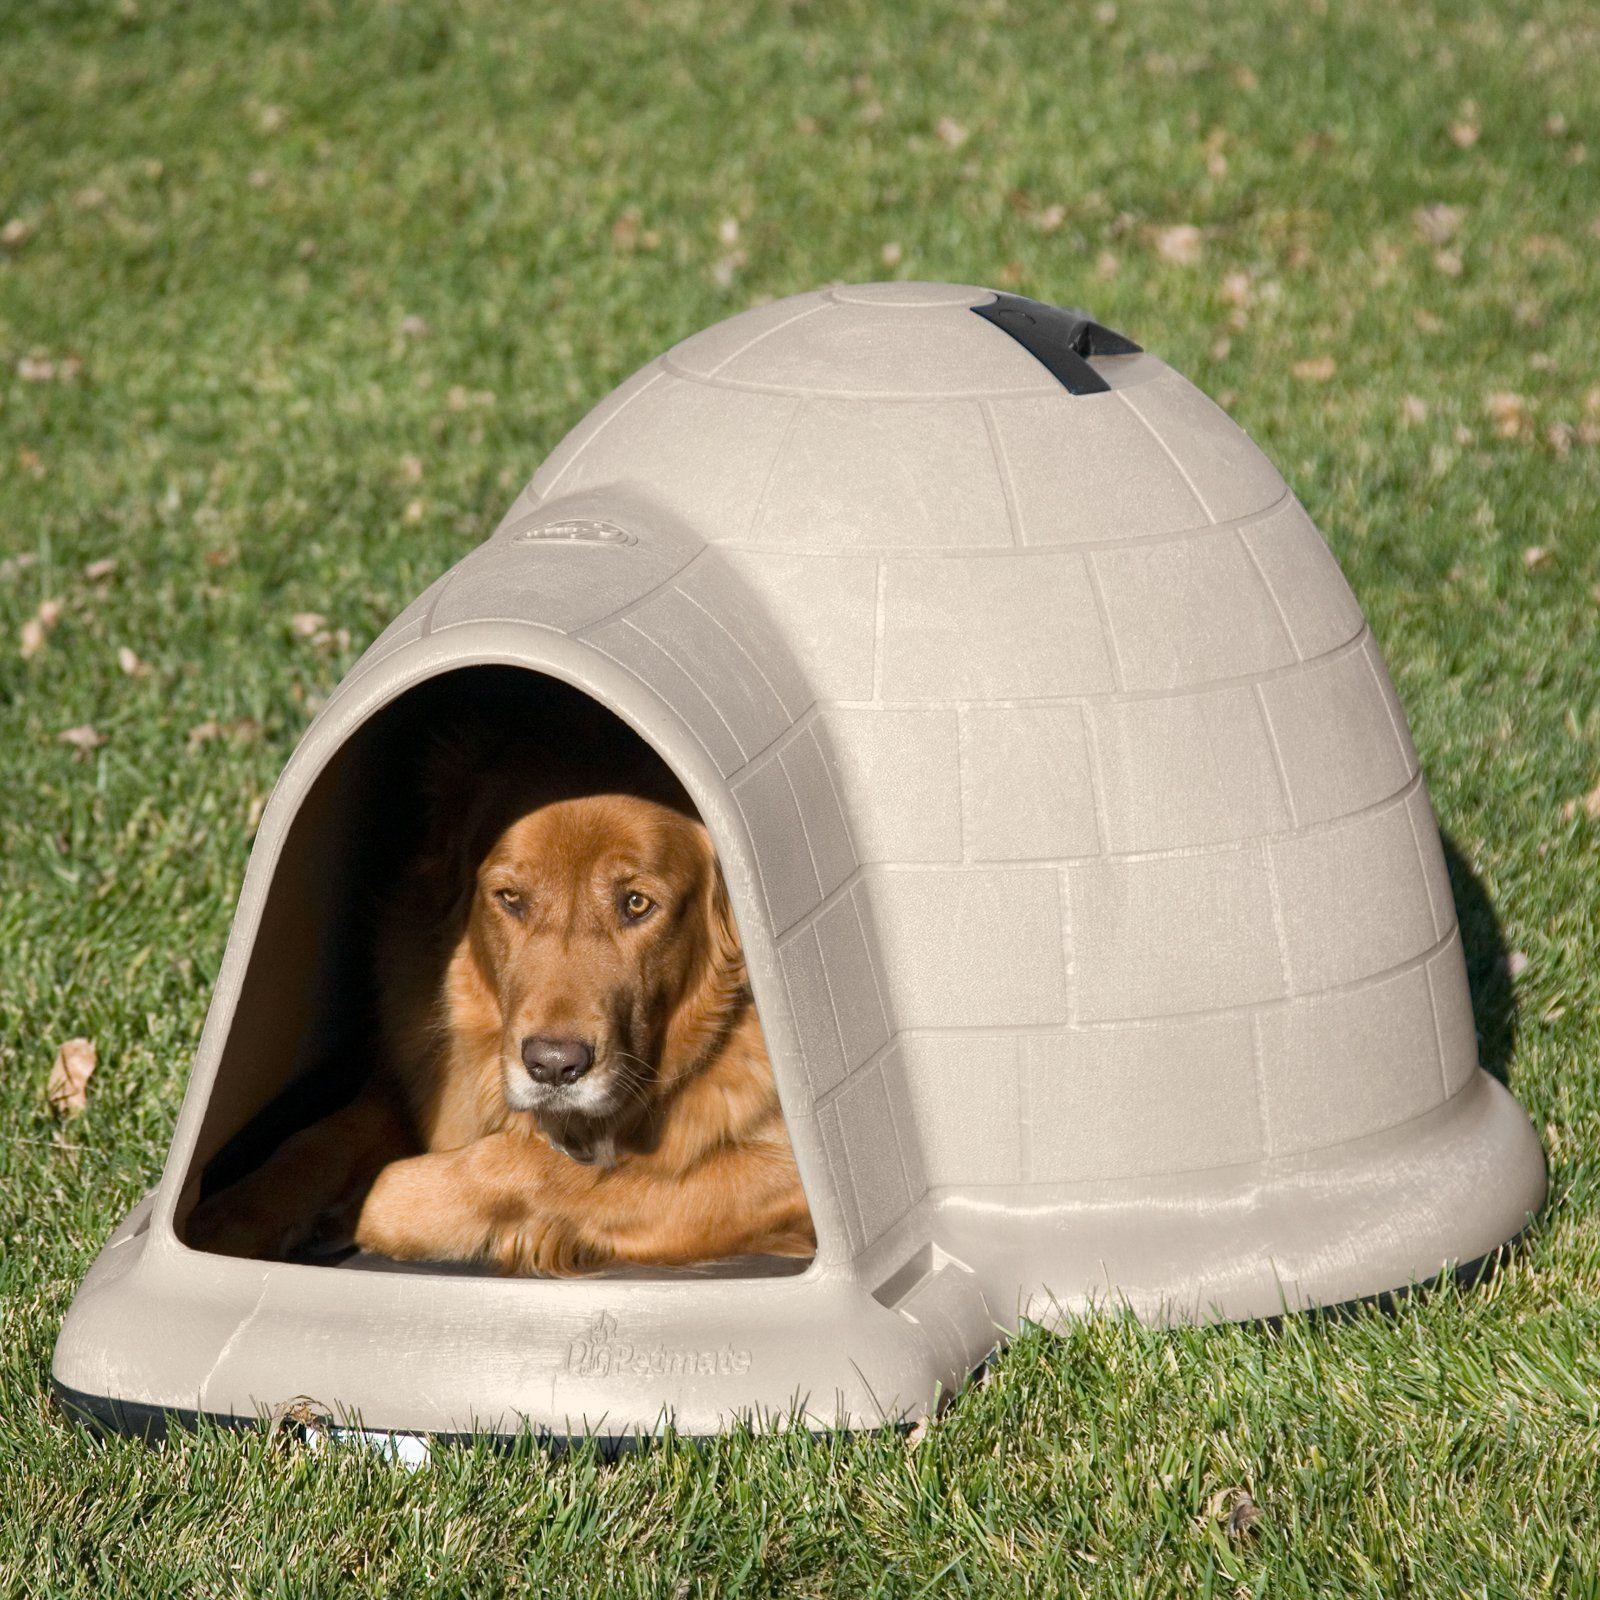 Petmate Indigo Dog House Tan Igloo Dog House Dog Door Cool